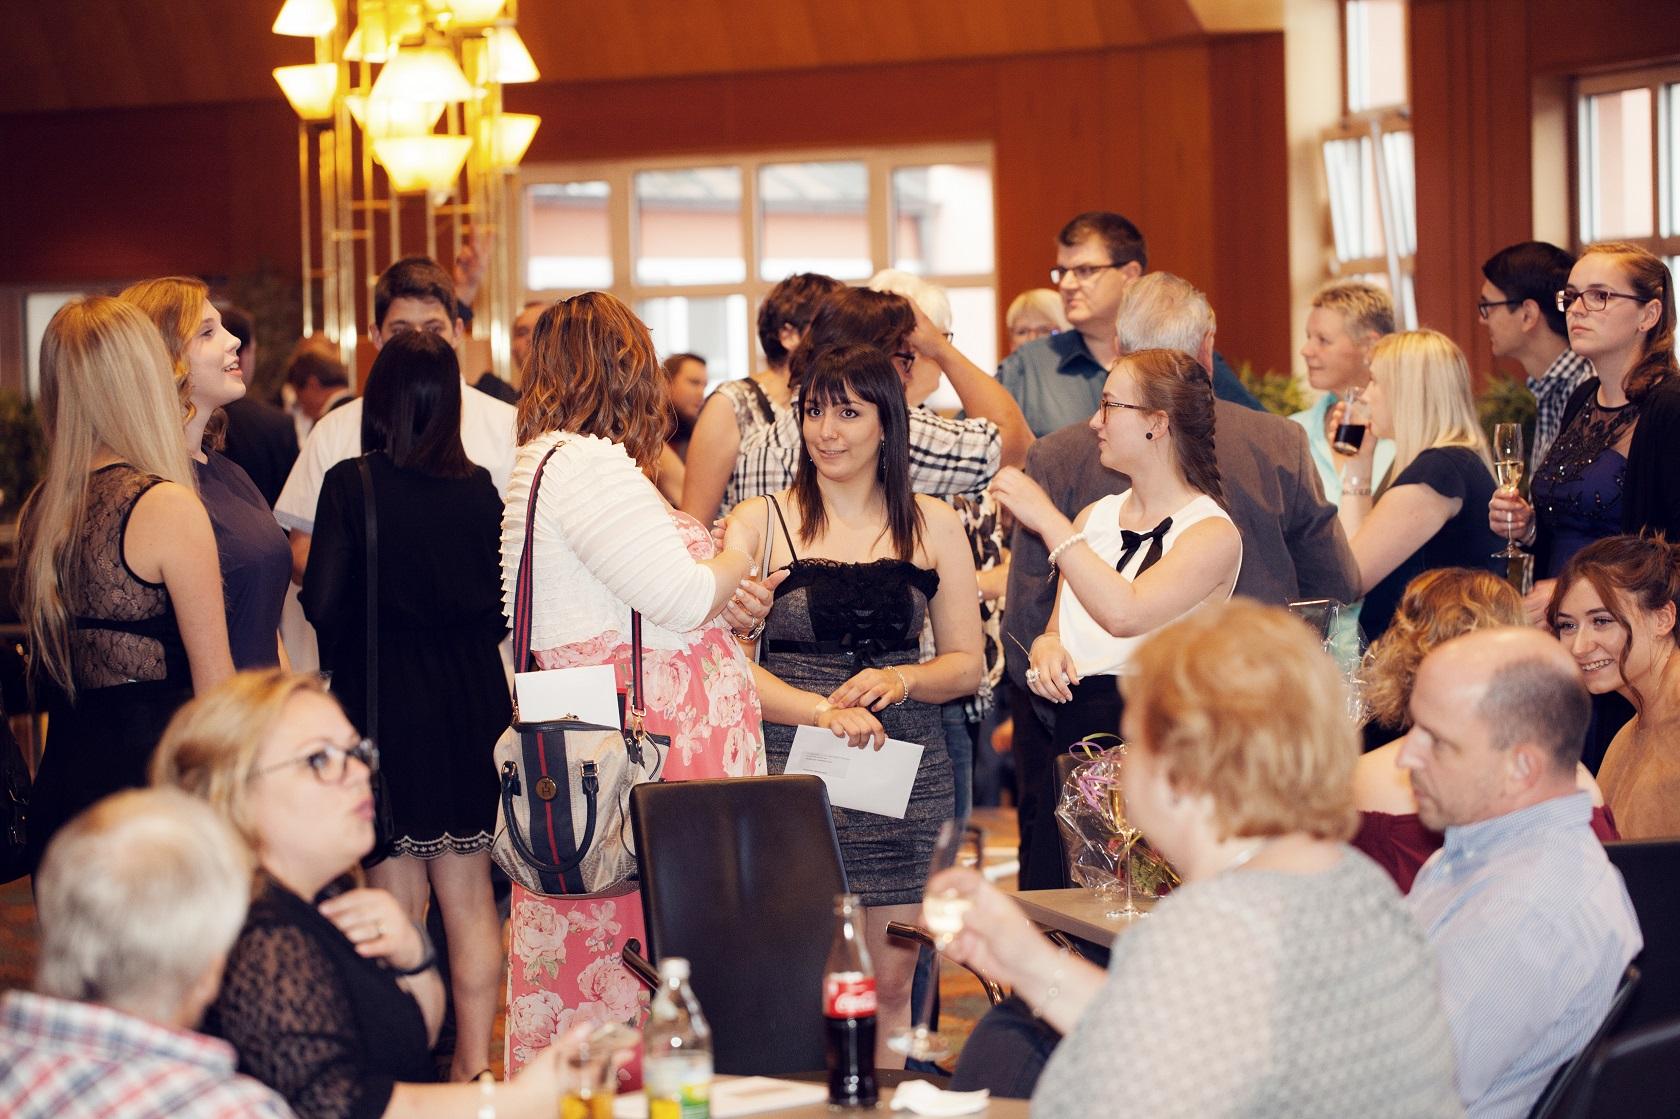 Freisprechungsfeier Bruchsal 2017 Saal füllt sich